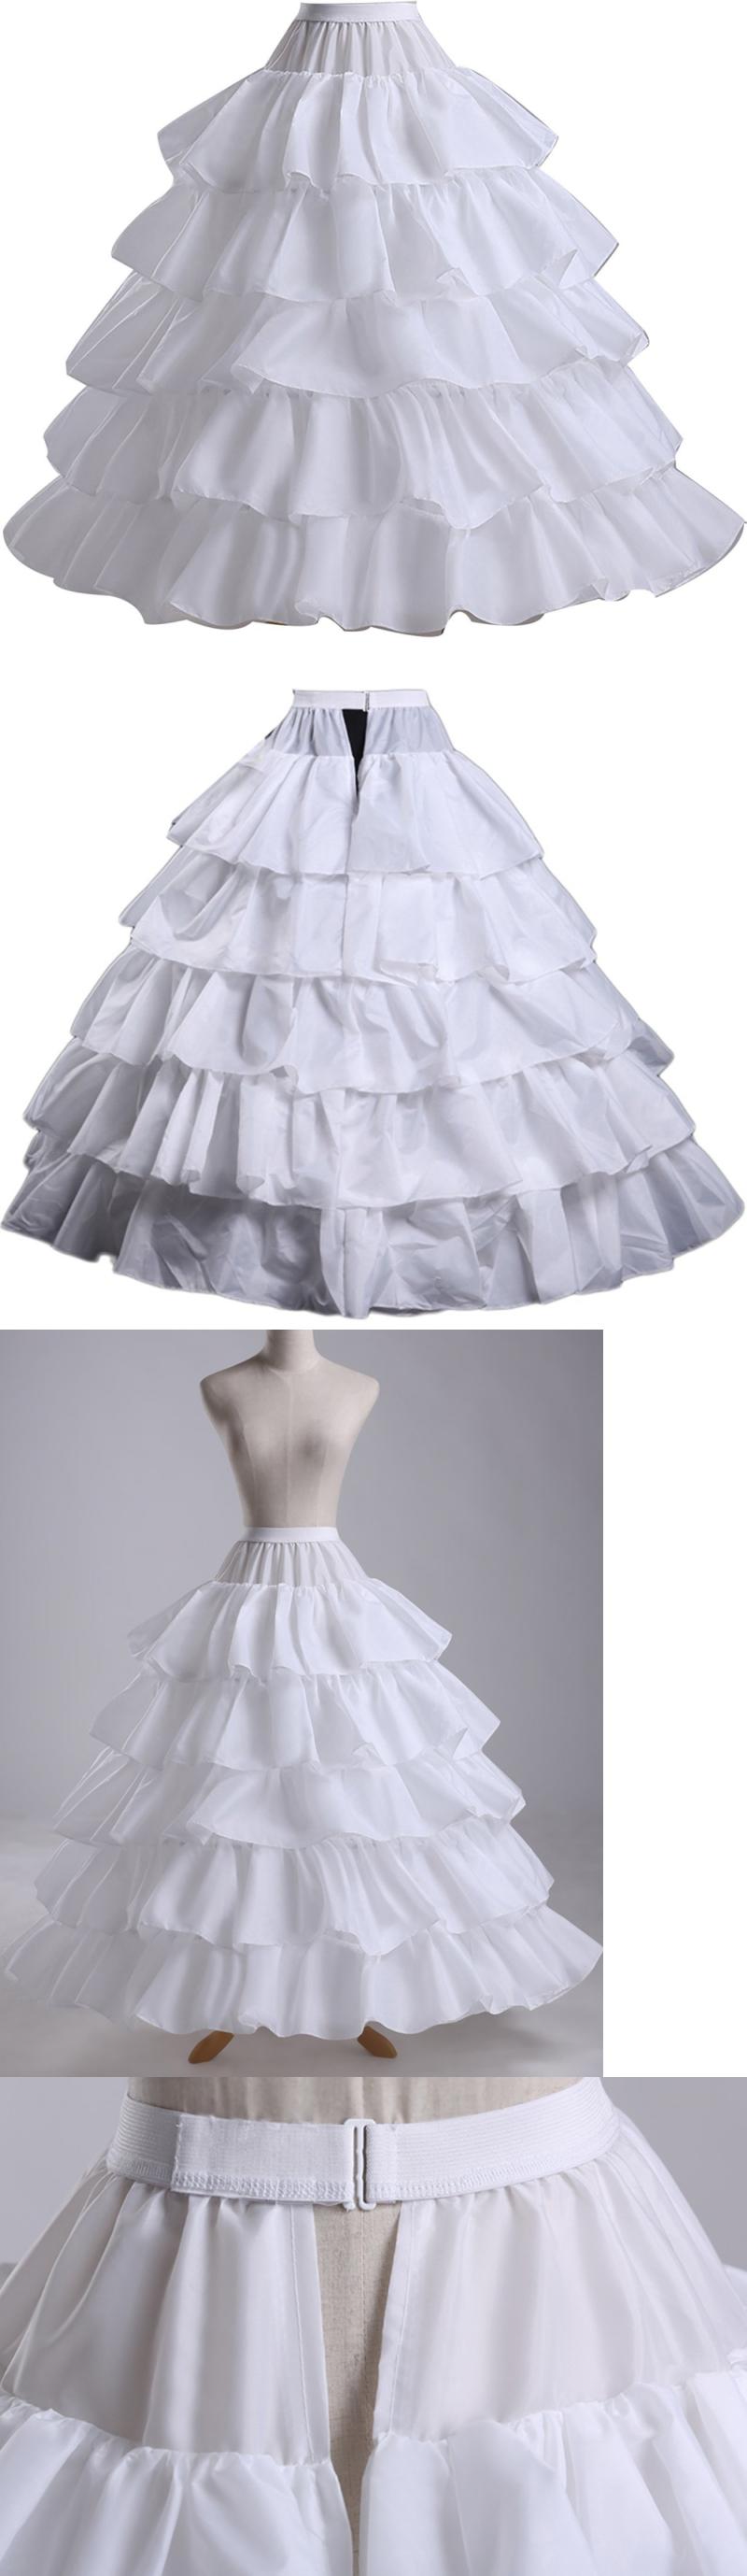 Wedding dress slip  Slips Petticoats and Hoops  Wantdo Full Hoop  Bones Bridal